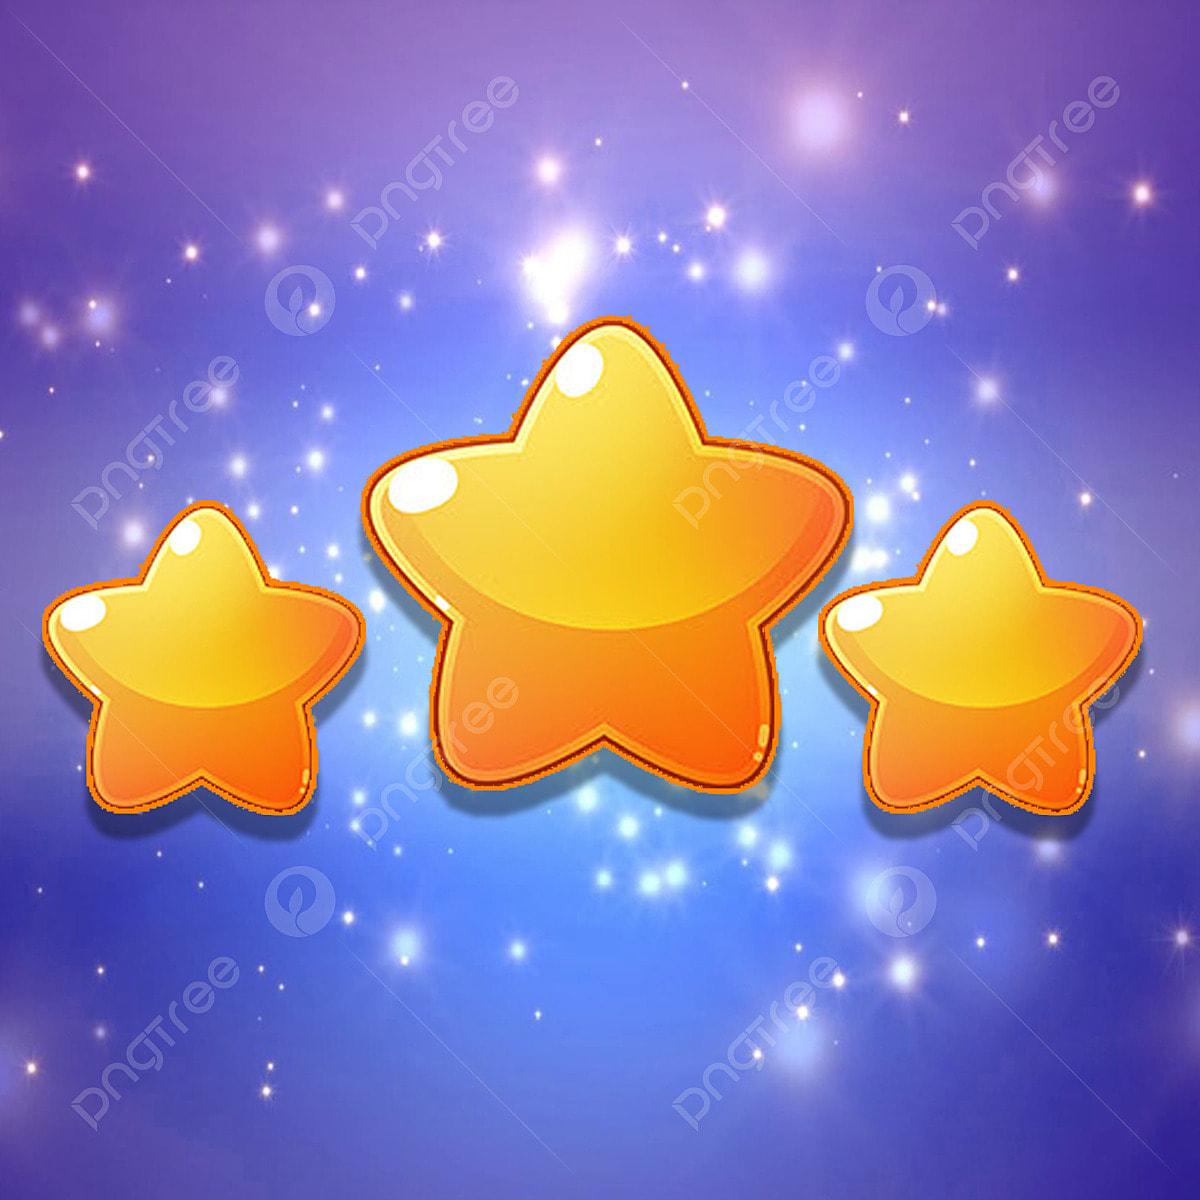 картинки трех звезд фасон куртки